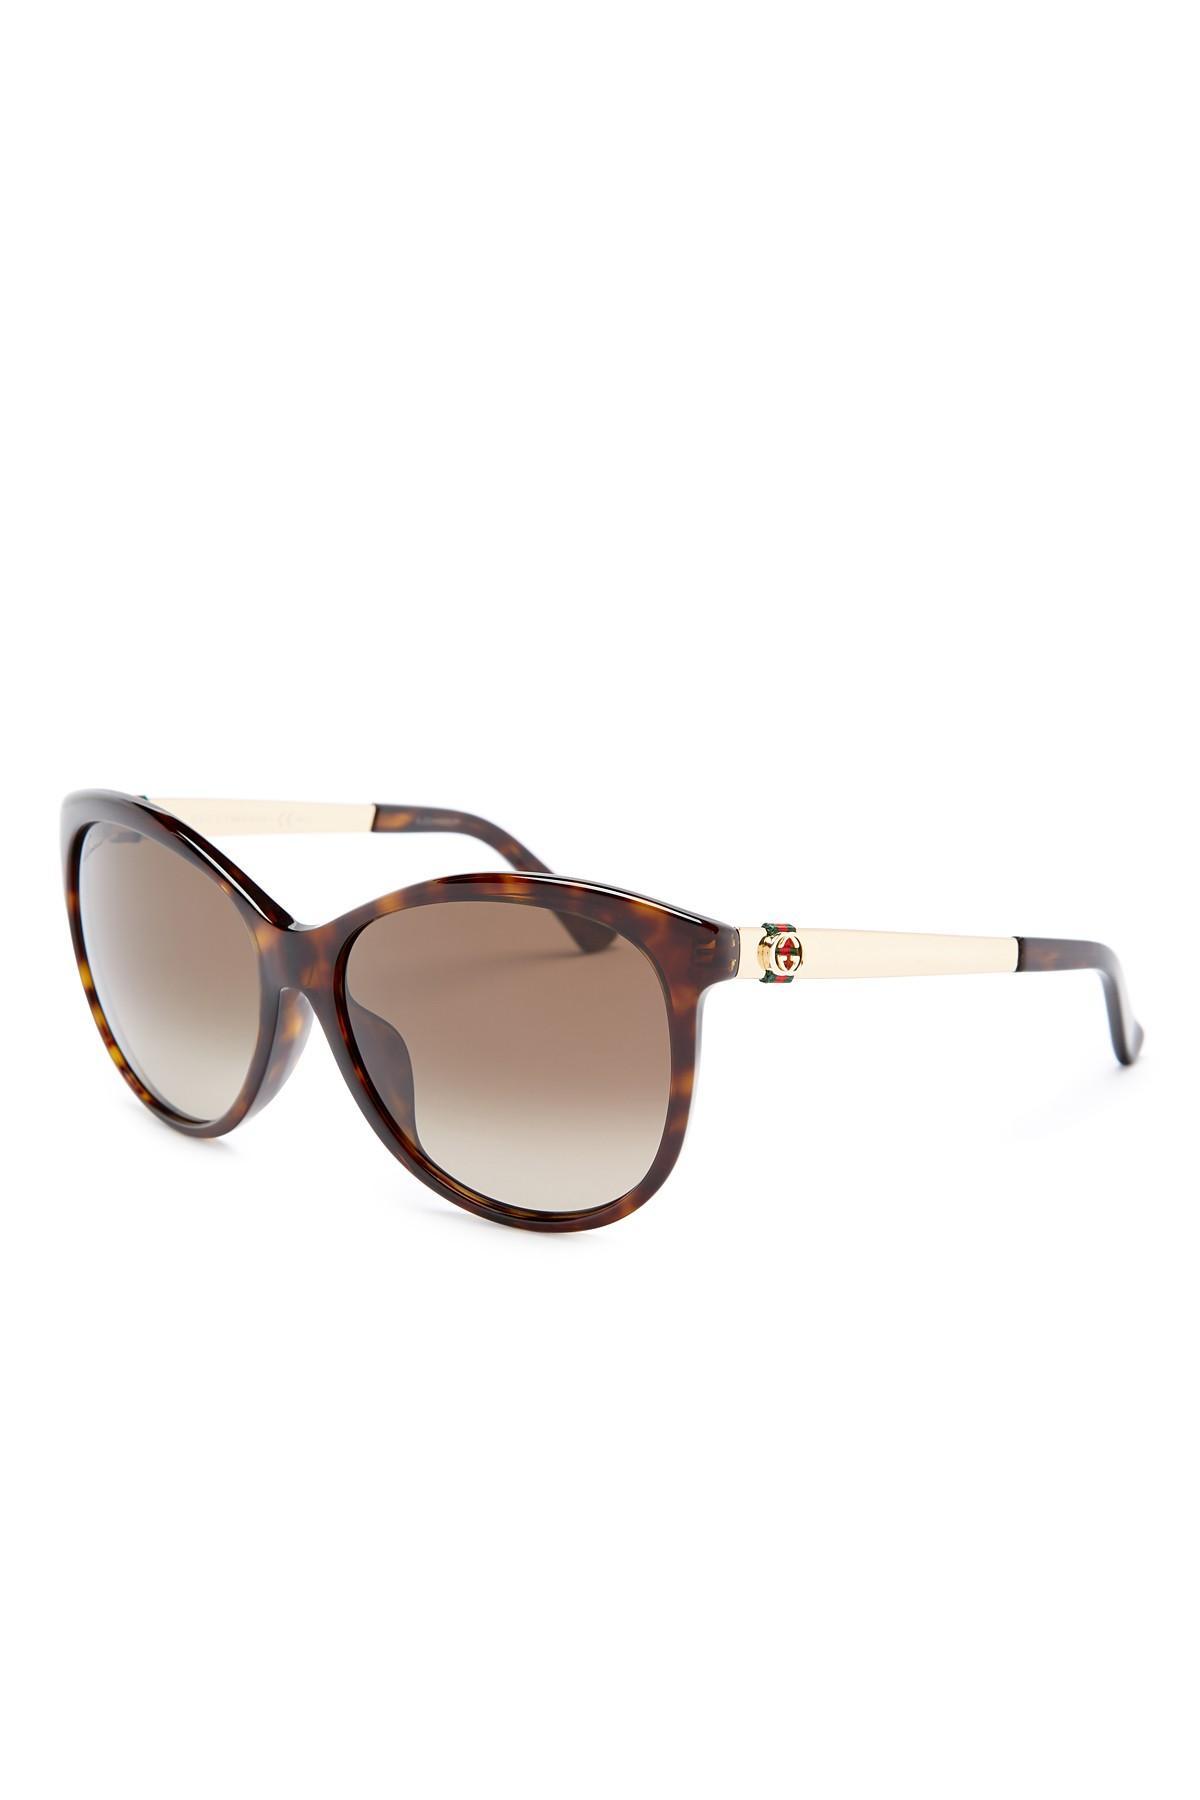 6e5aa4a6ef Gucci Women s Cat Eye Sunglasses Nordstrom Rack